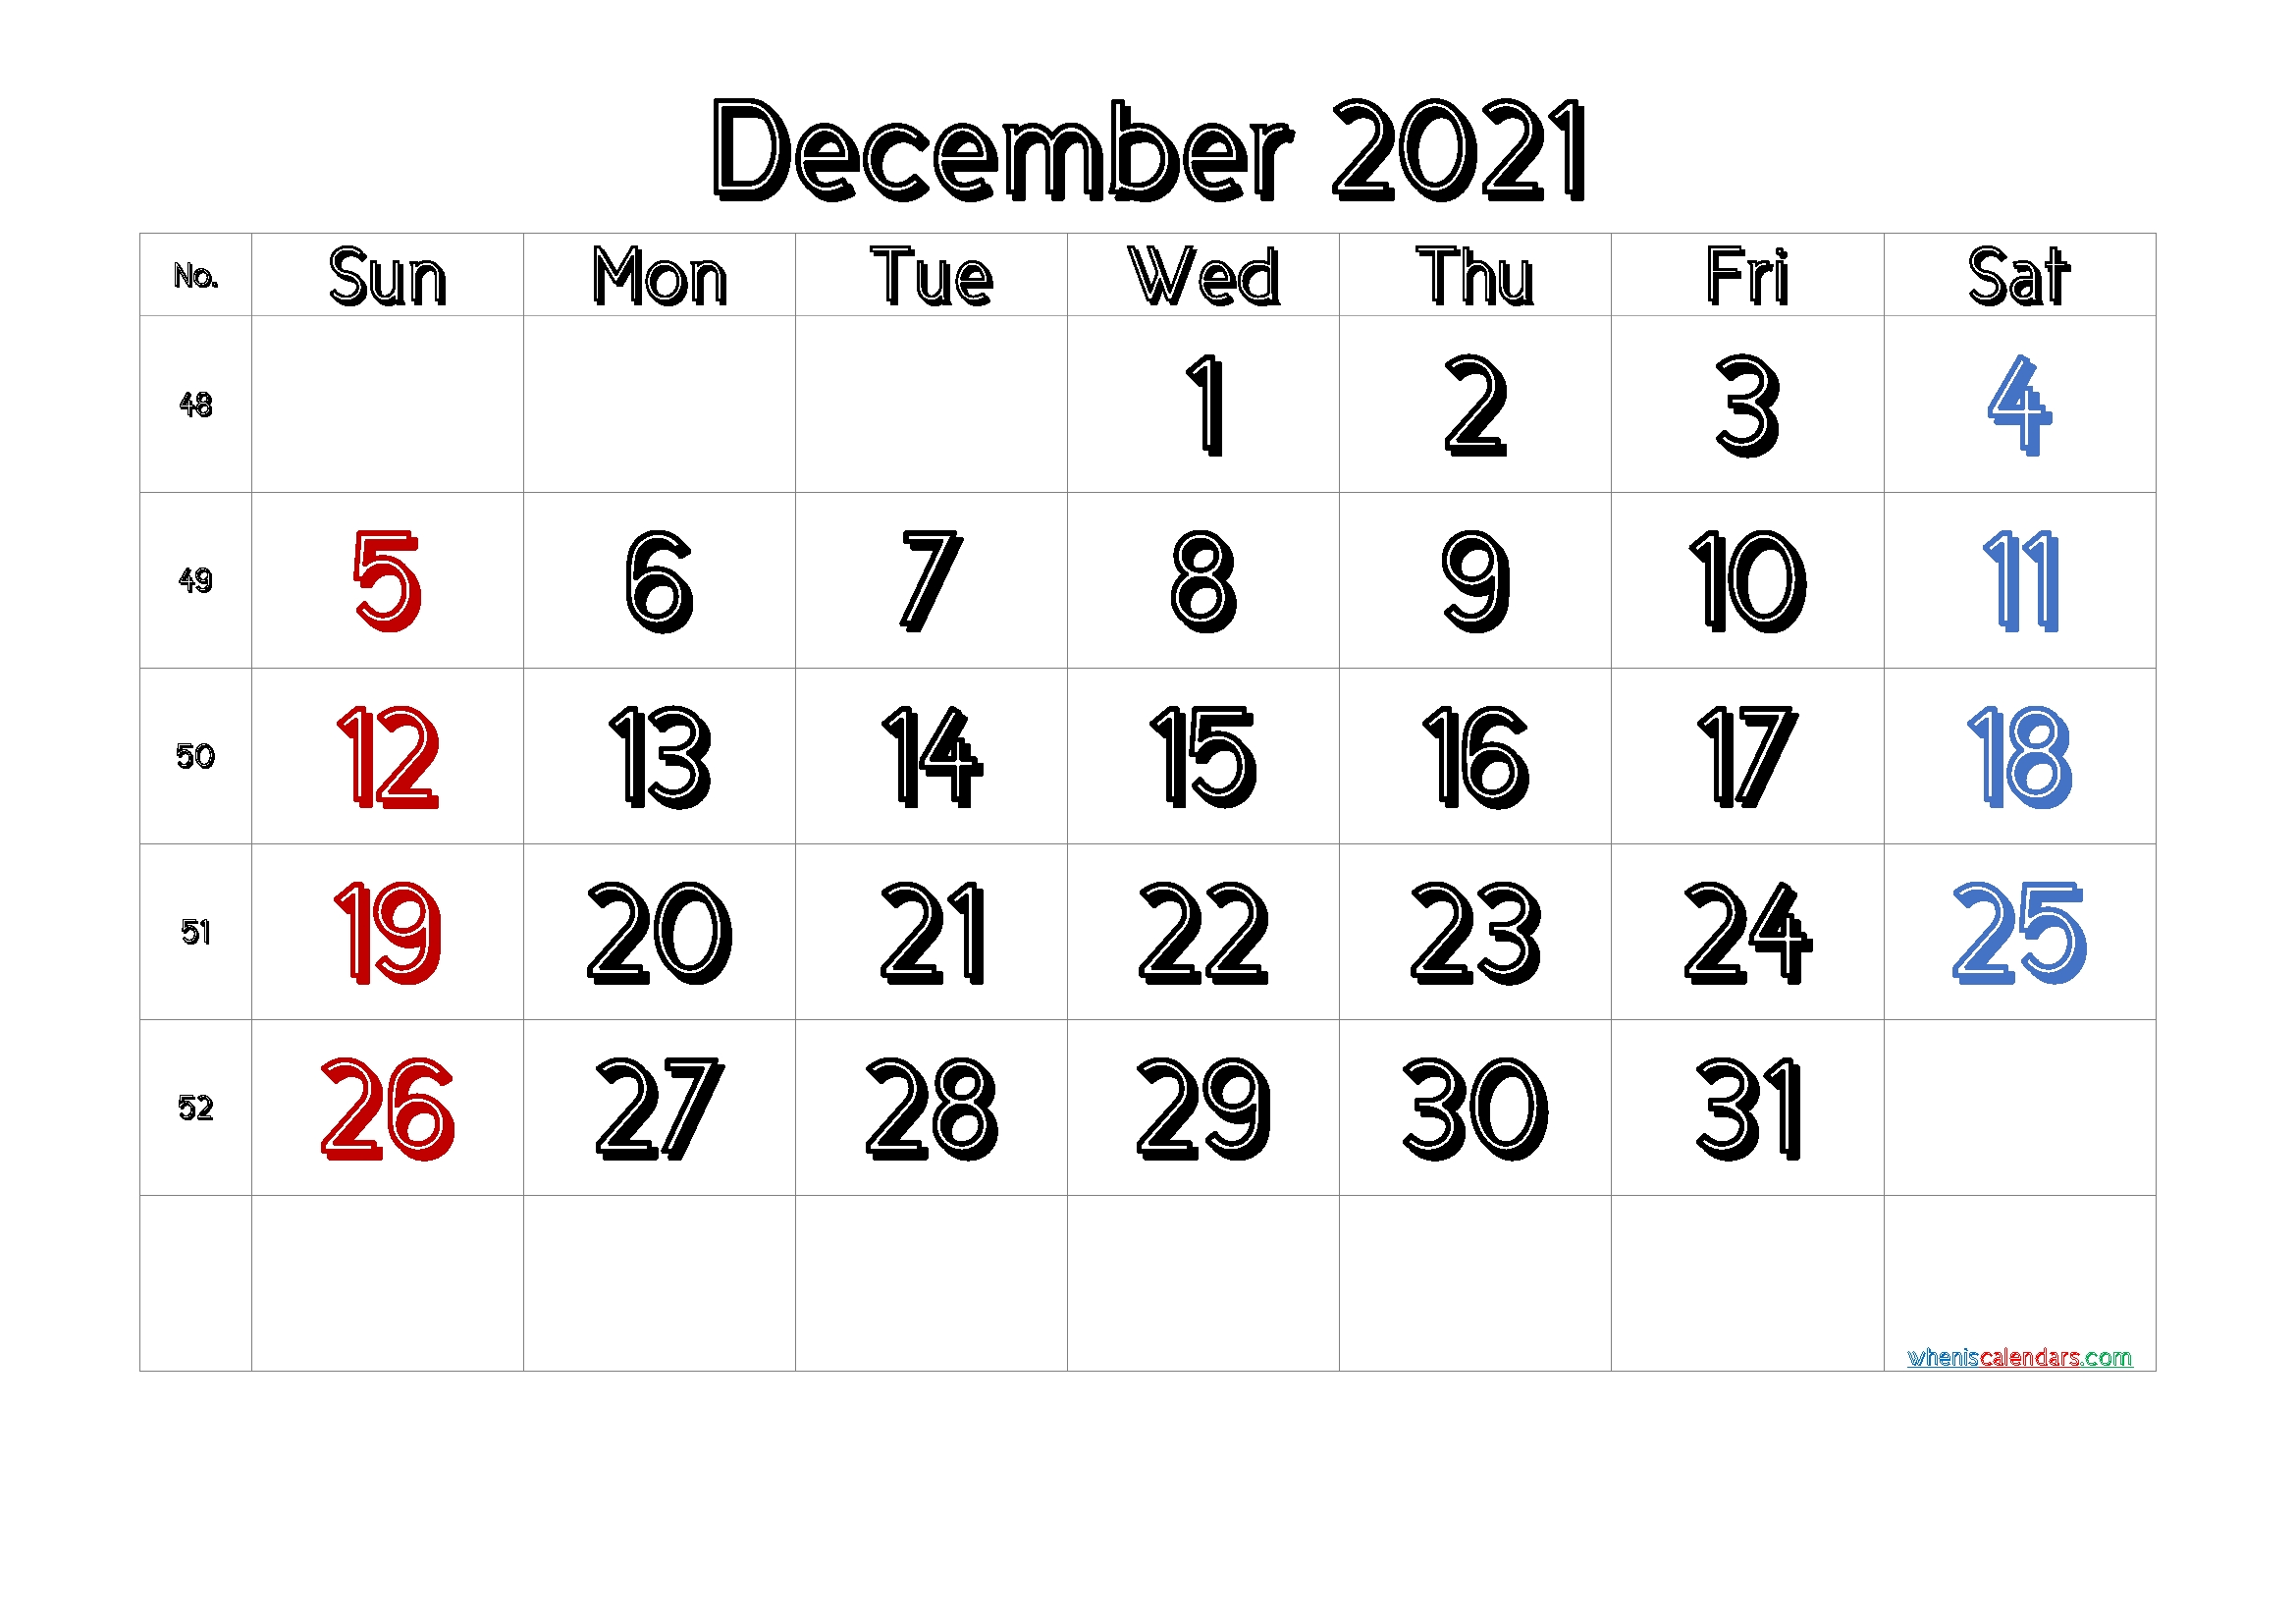 Free Printable Calendar December 2021 2022 And 2023 December 2021 And January 2022 Calendar